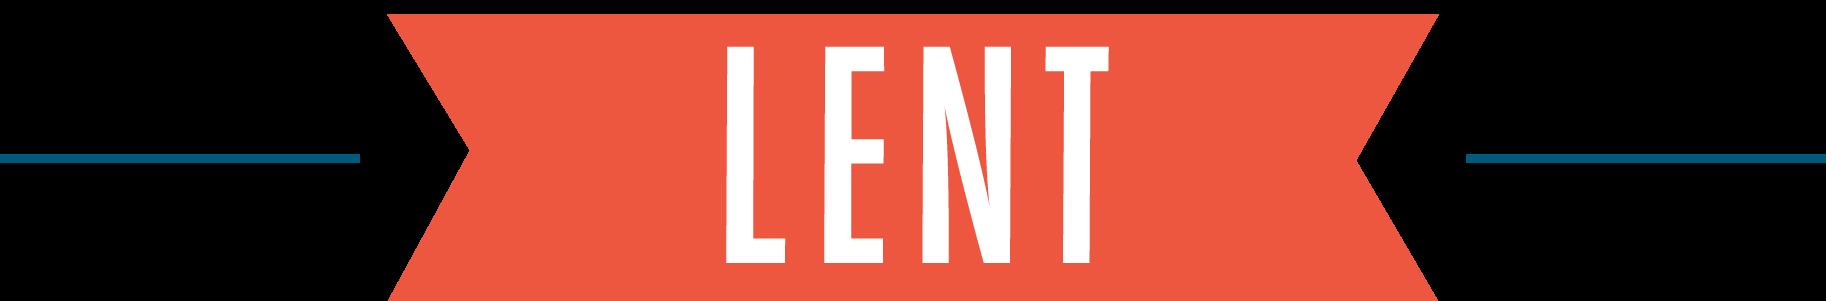 Lent-Header